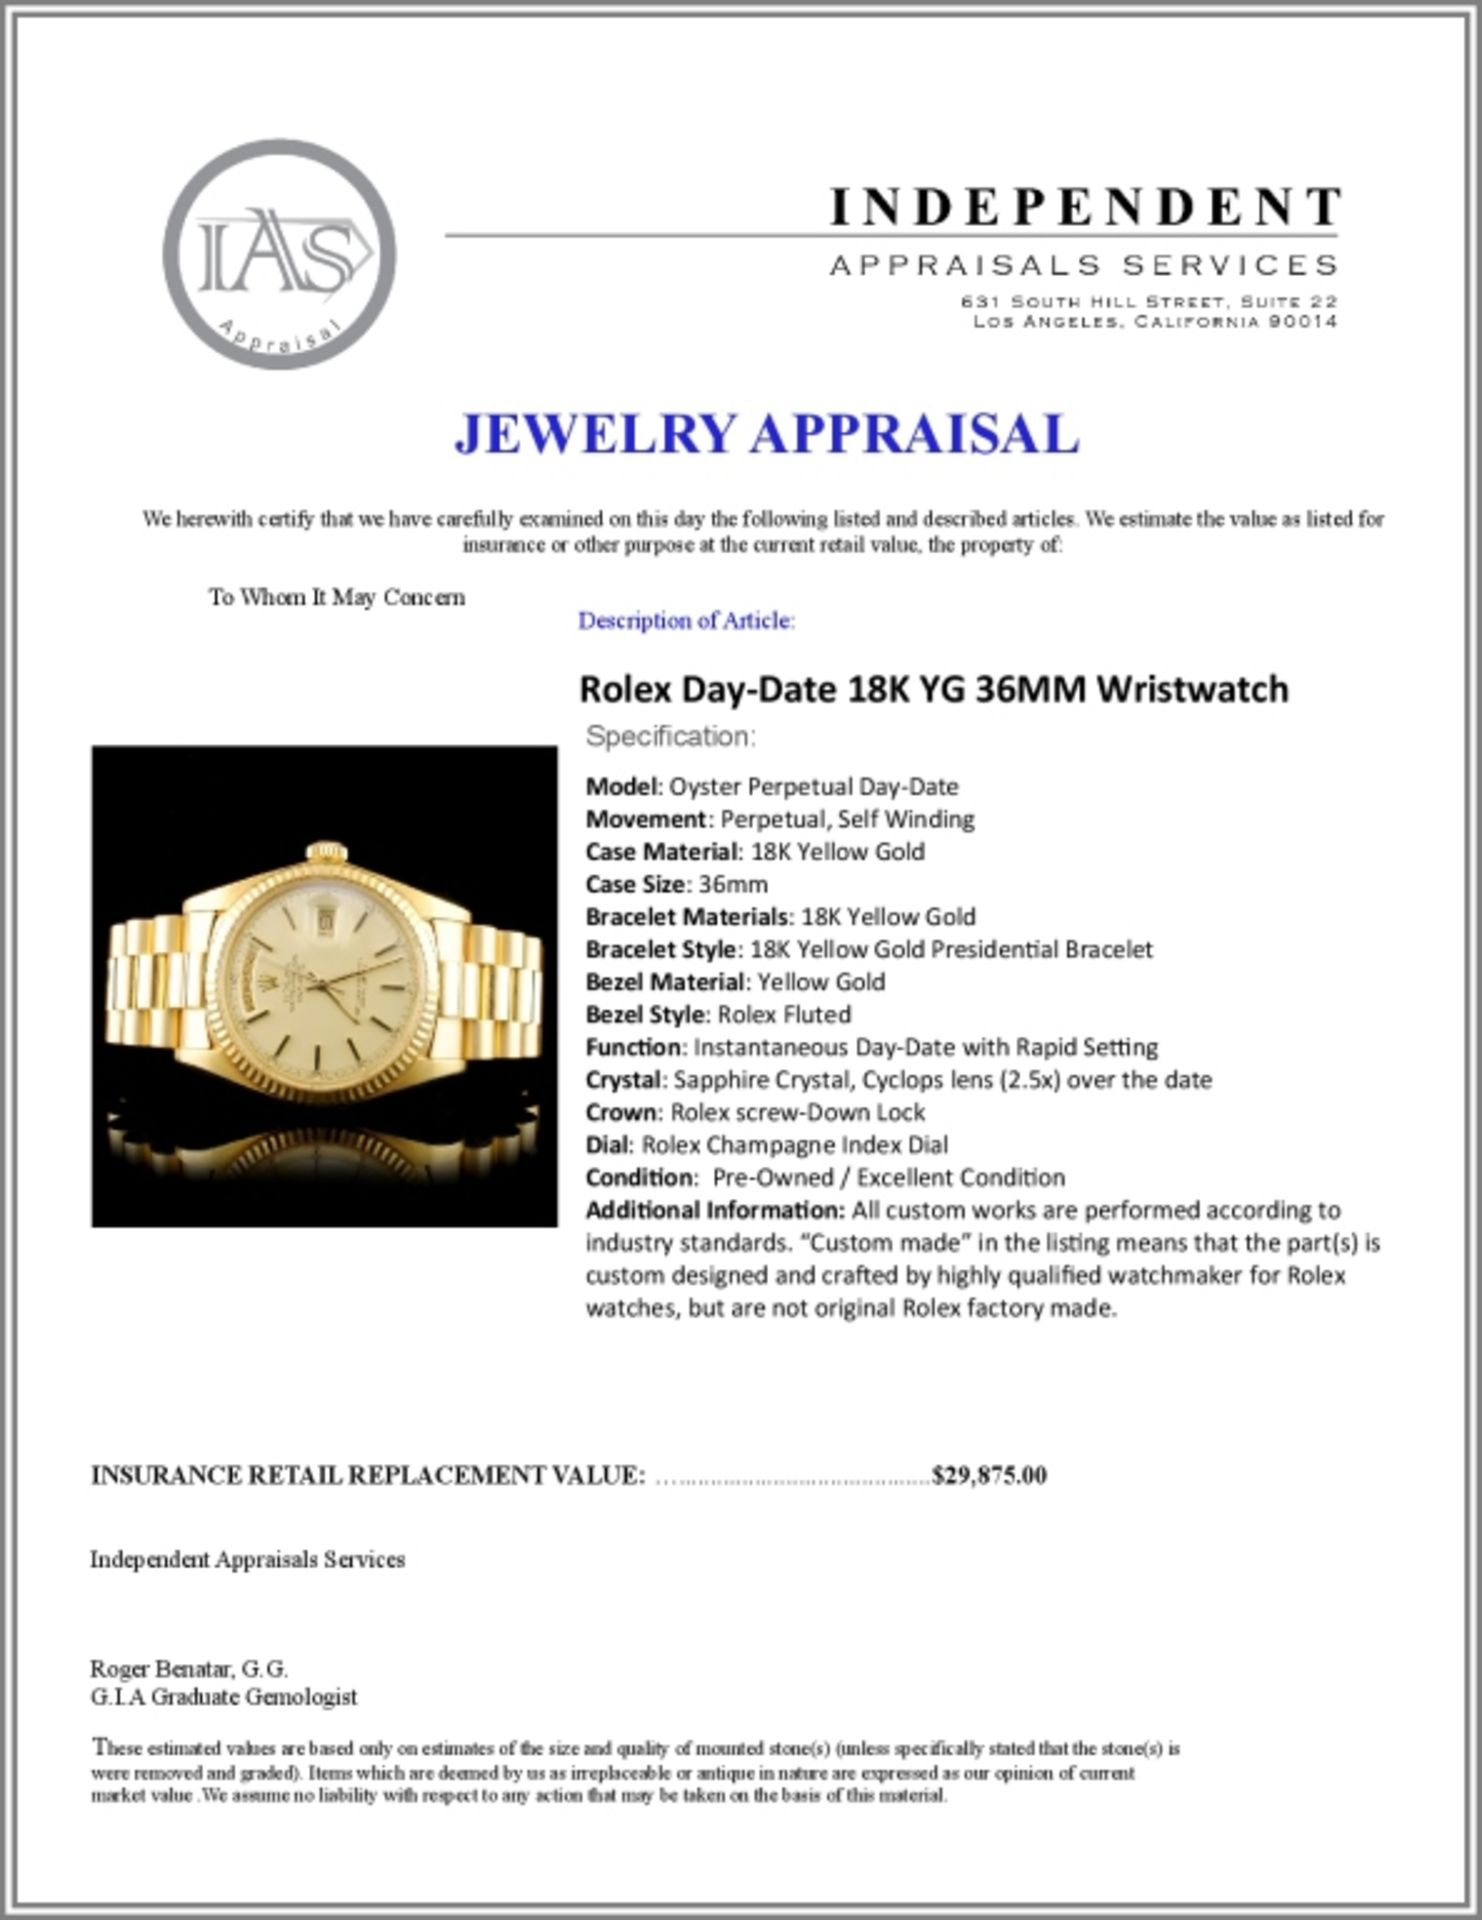 Rolex Day-Date 18K YG 36MM Wristwatch - Image 6 of 6